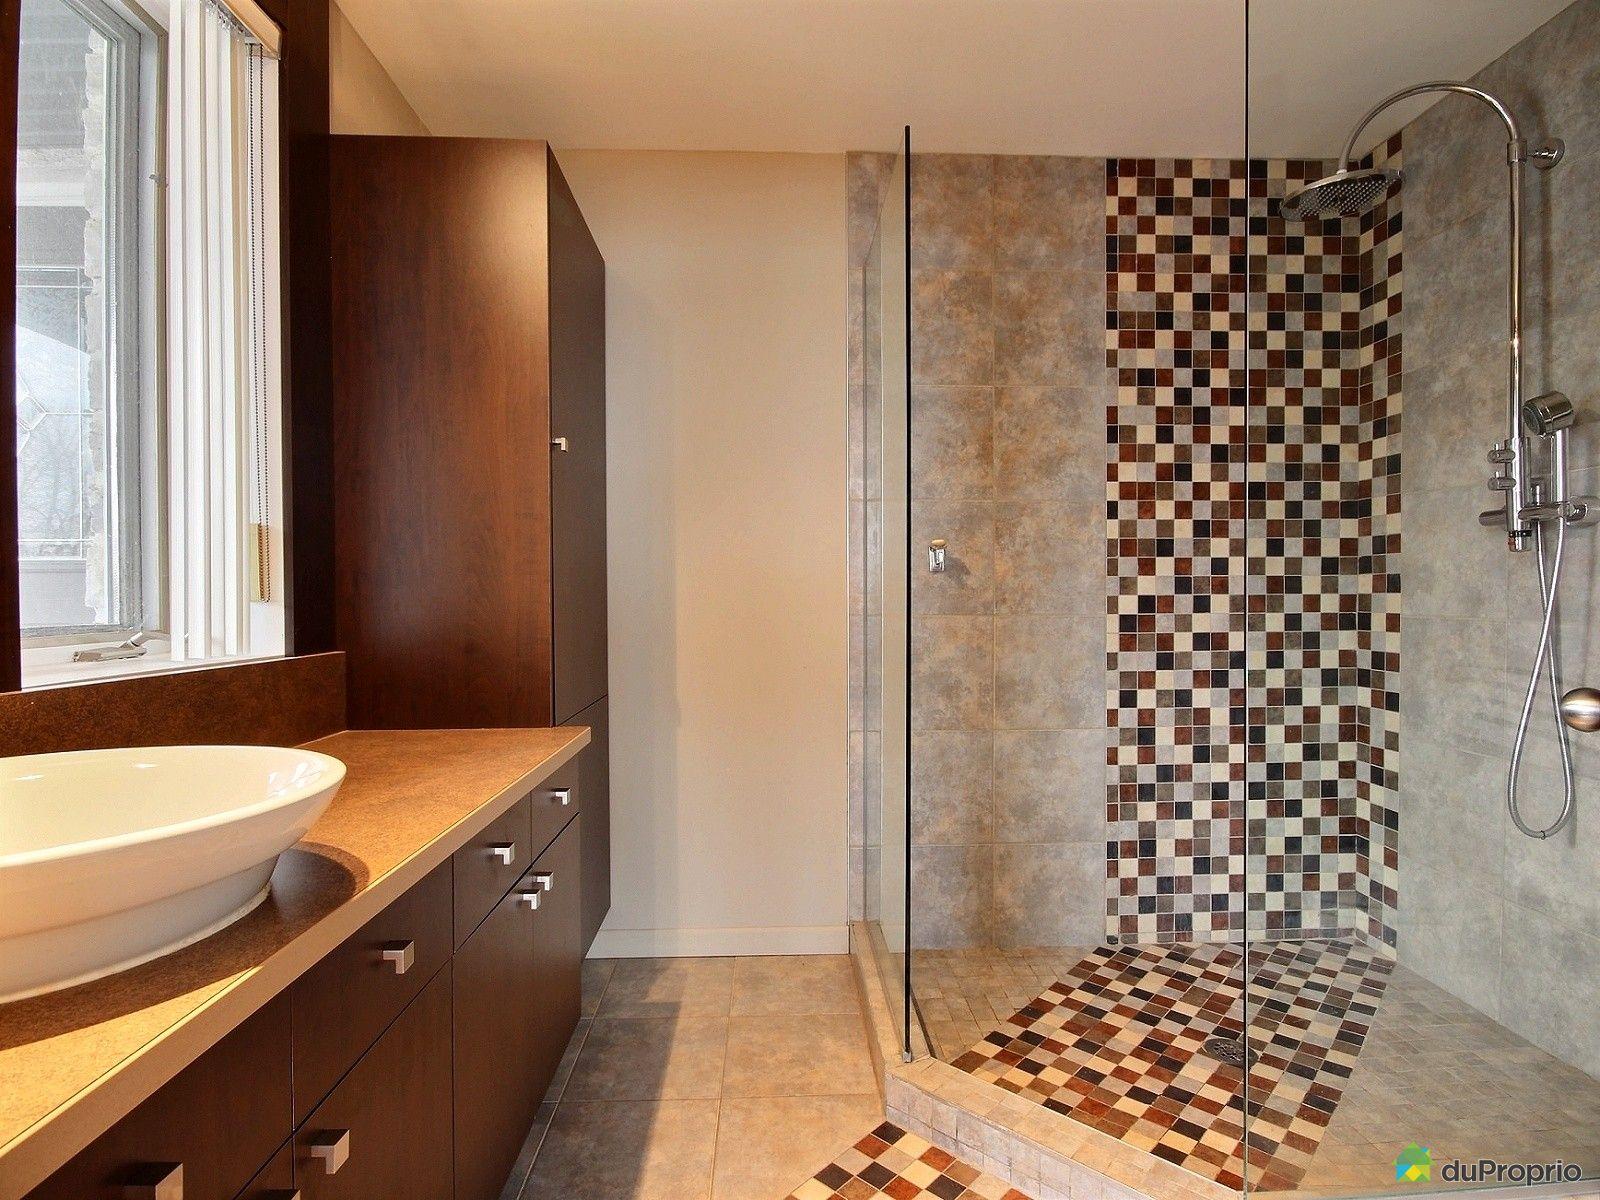 maison vendre ile d 39 orl ans st laurent 6534 chemin royal immobilier qu bec duproprio 664955. Black Bedroom Furniture Sets. Home Design Ideas